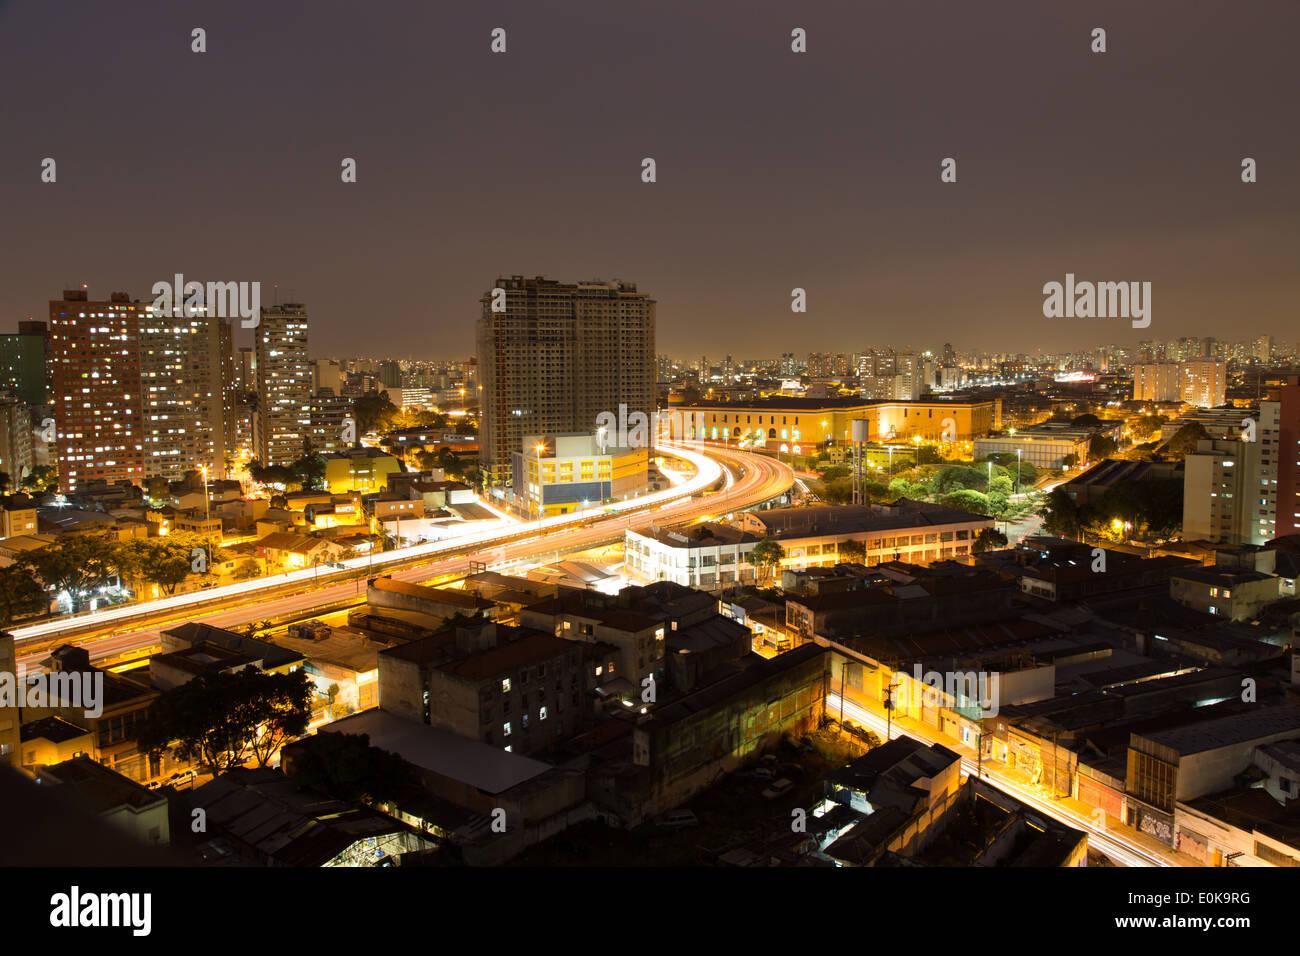 Vue aérienne de la ville de nuit, Viaduto do Glicerio Glicerio (viaduc) ou Viaduto Do (Leste-Oeste Viaduc Est-ouest), District de Liberdade, Sao Paulo Photo Stock